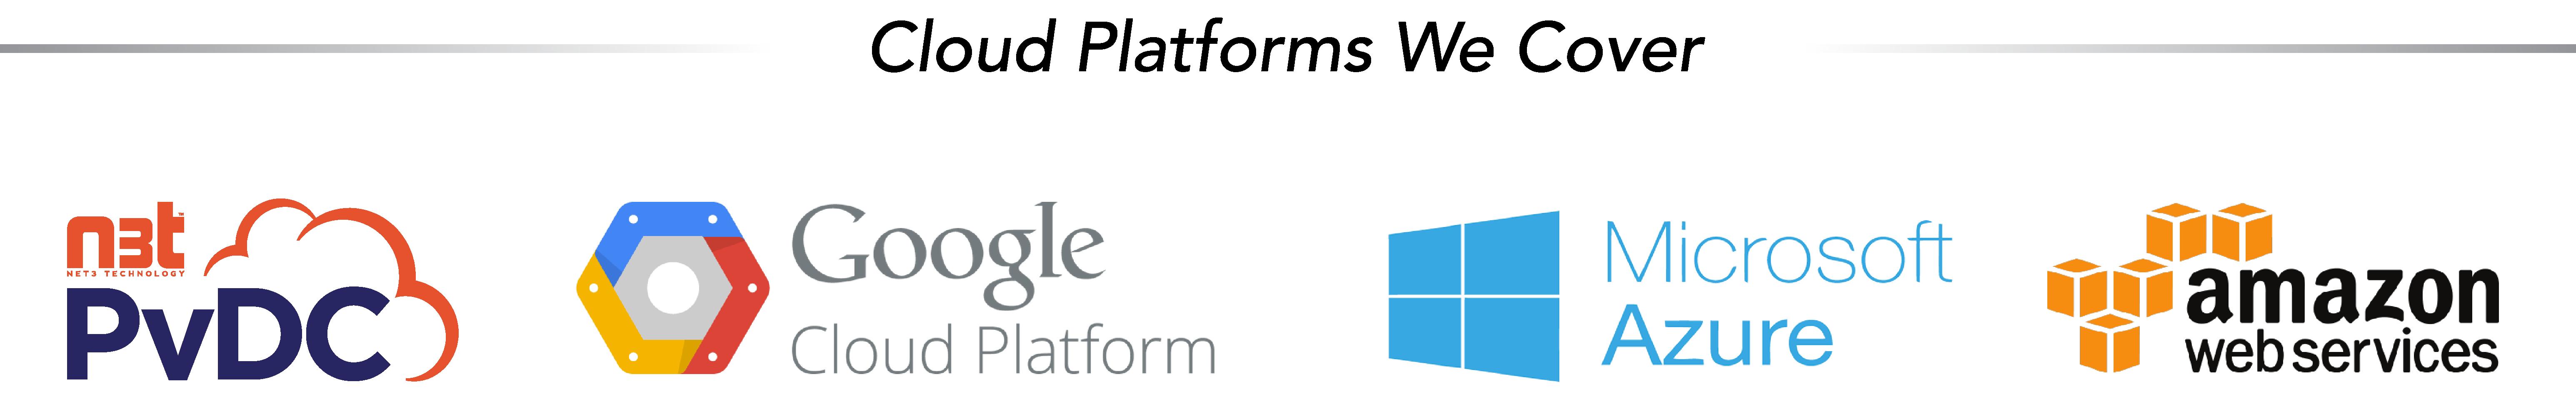 Cloud platforms-01-3